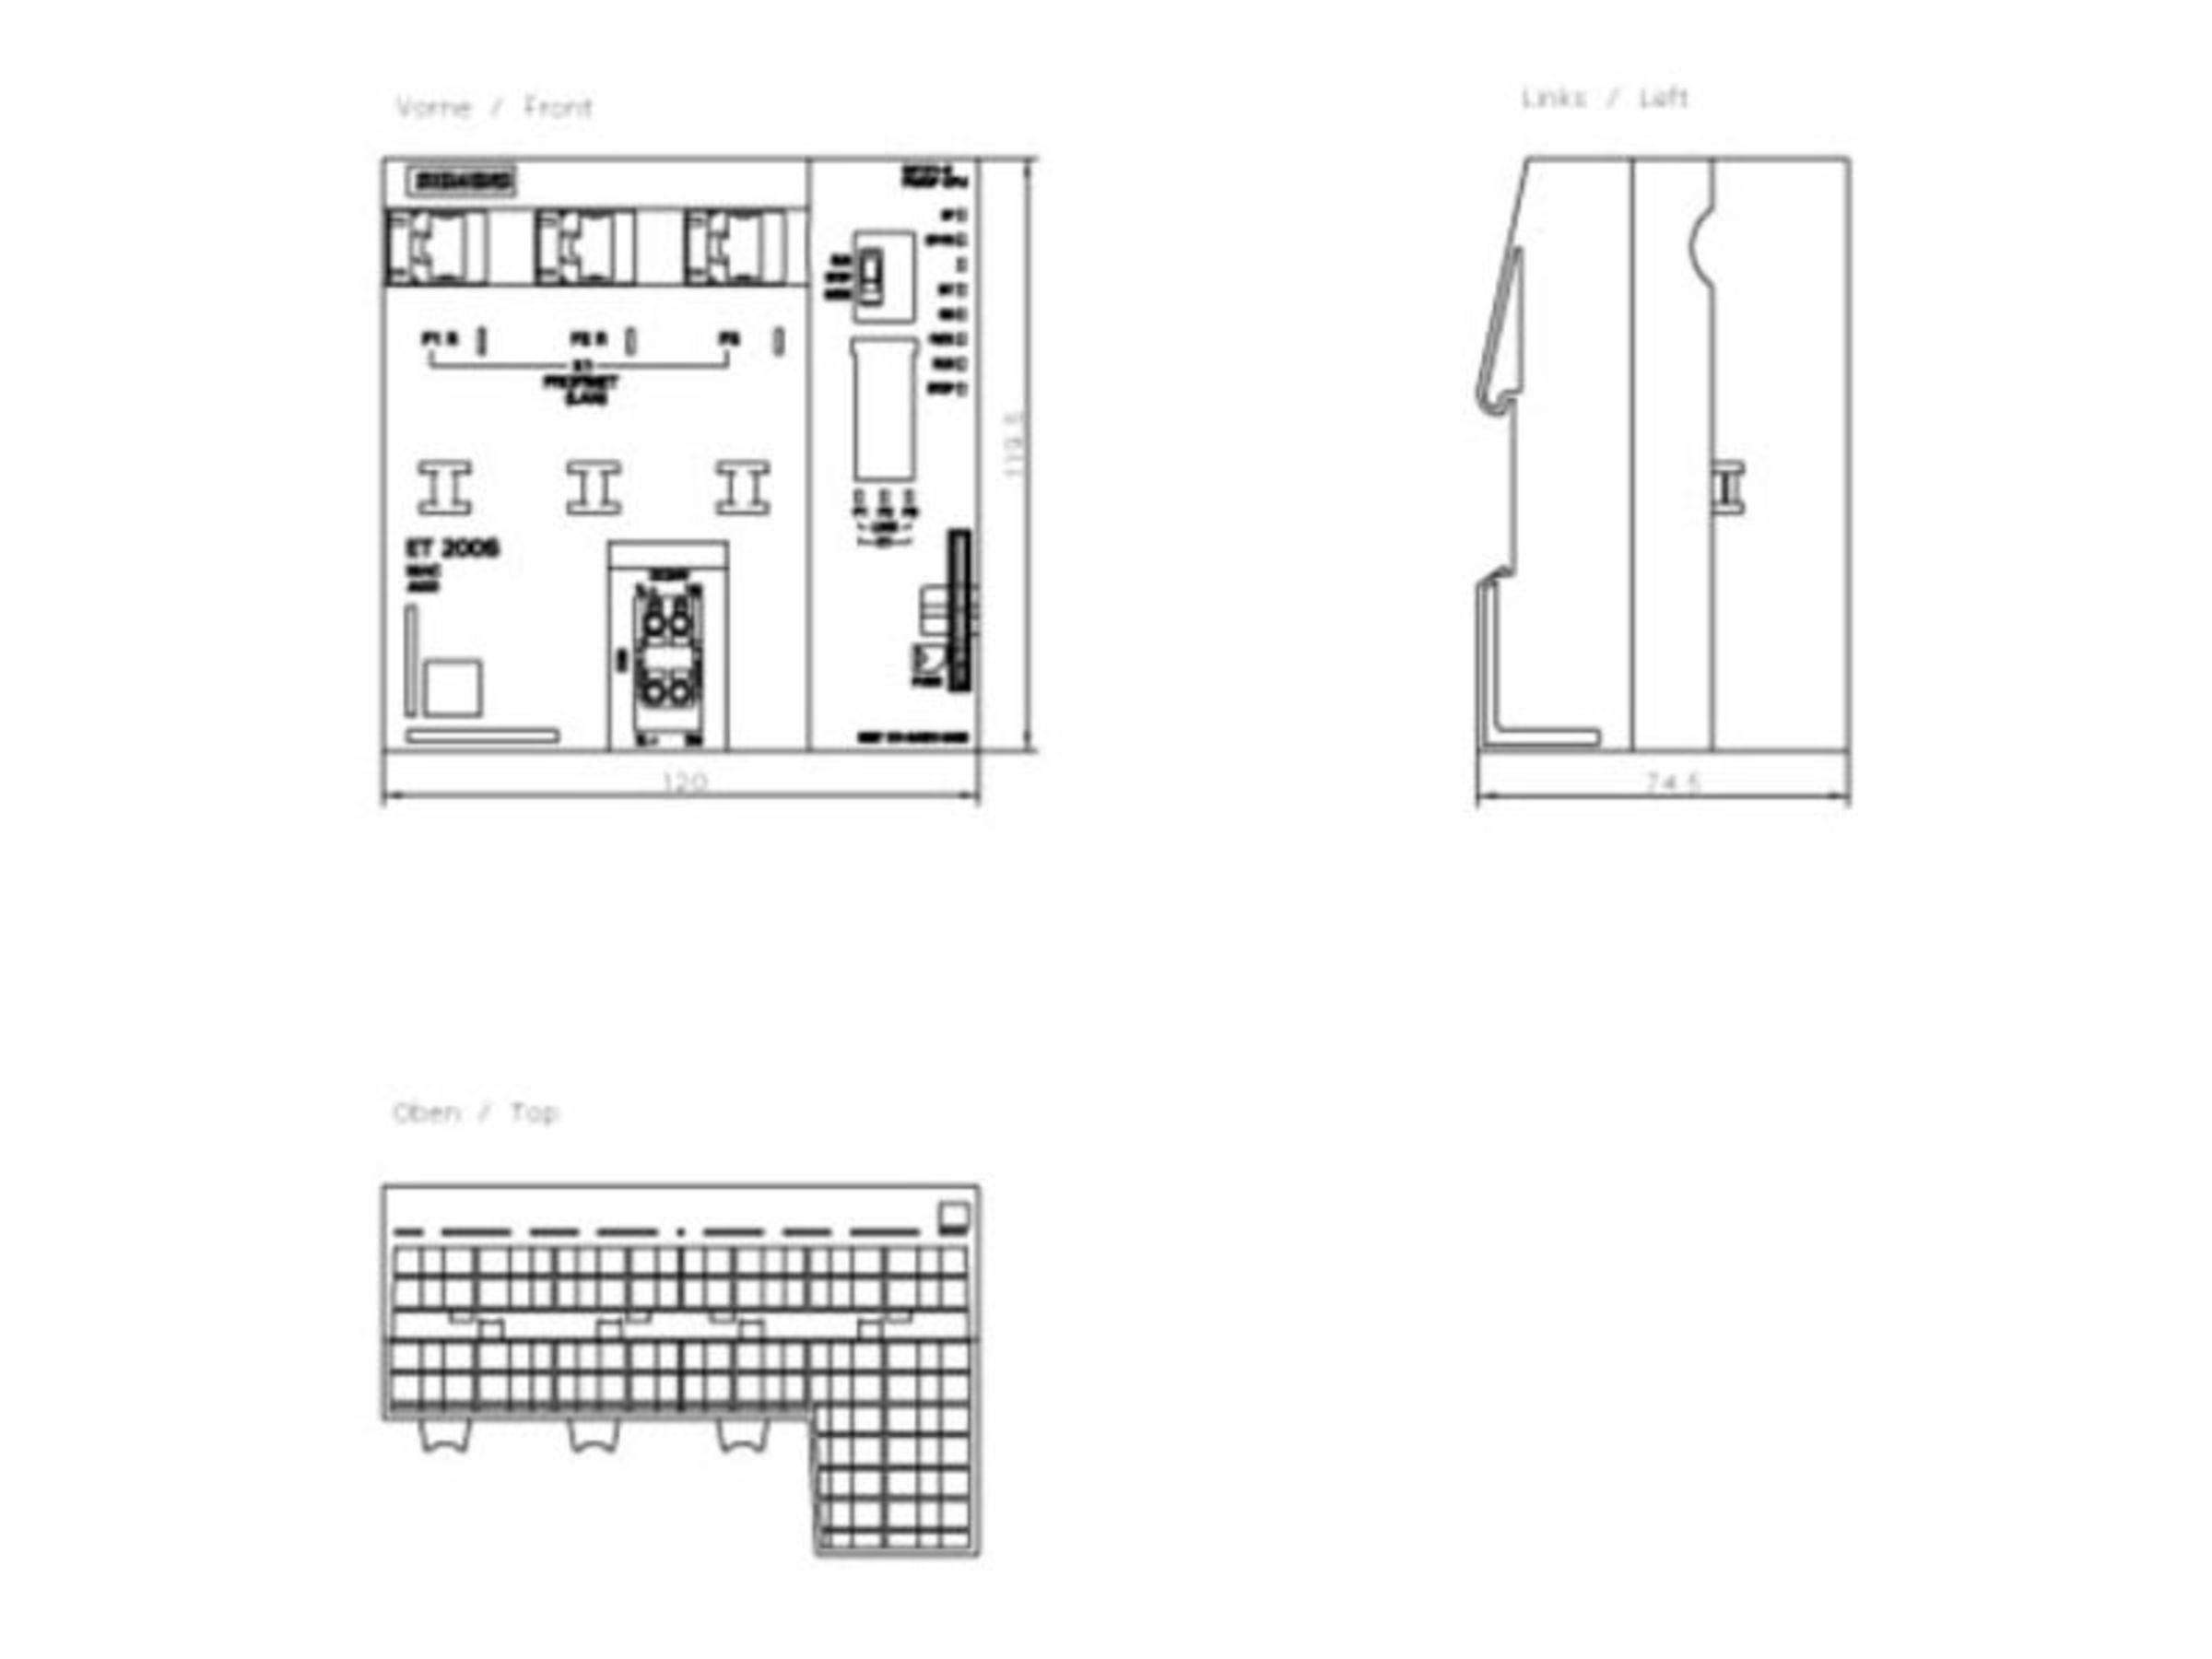 6ES7151-8AB01-0AB0 Interface Module | IM 151-8 PN/DP